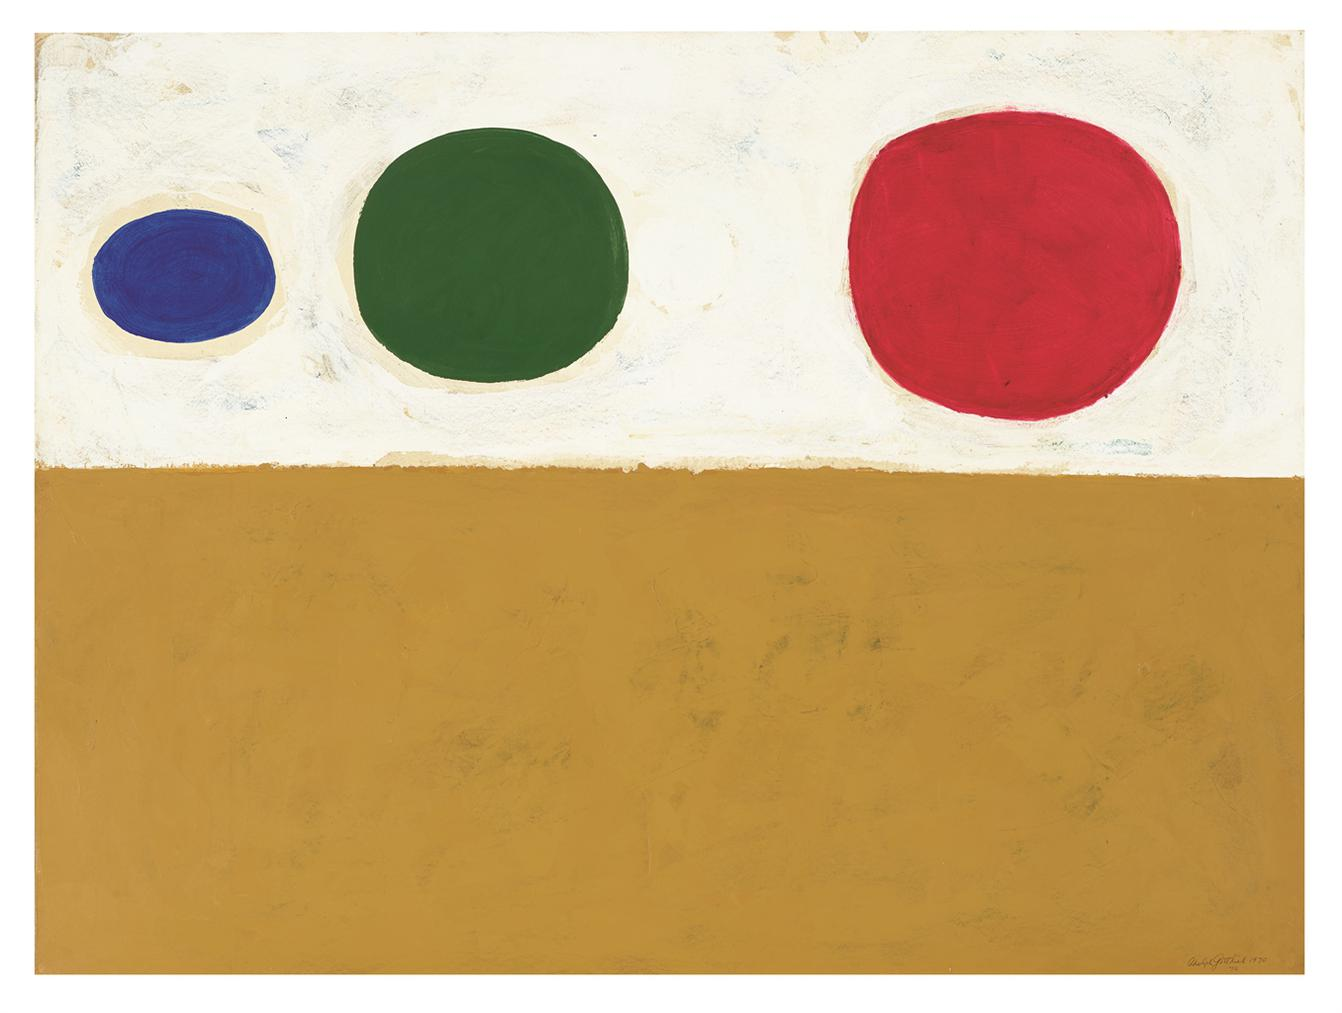 Adolph Gottlieb-Yellow Ochre-1970